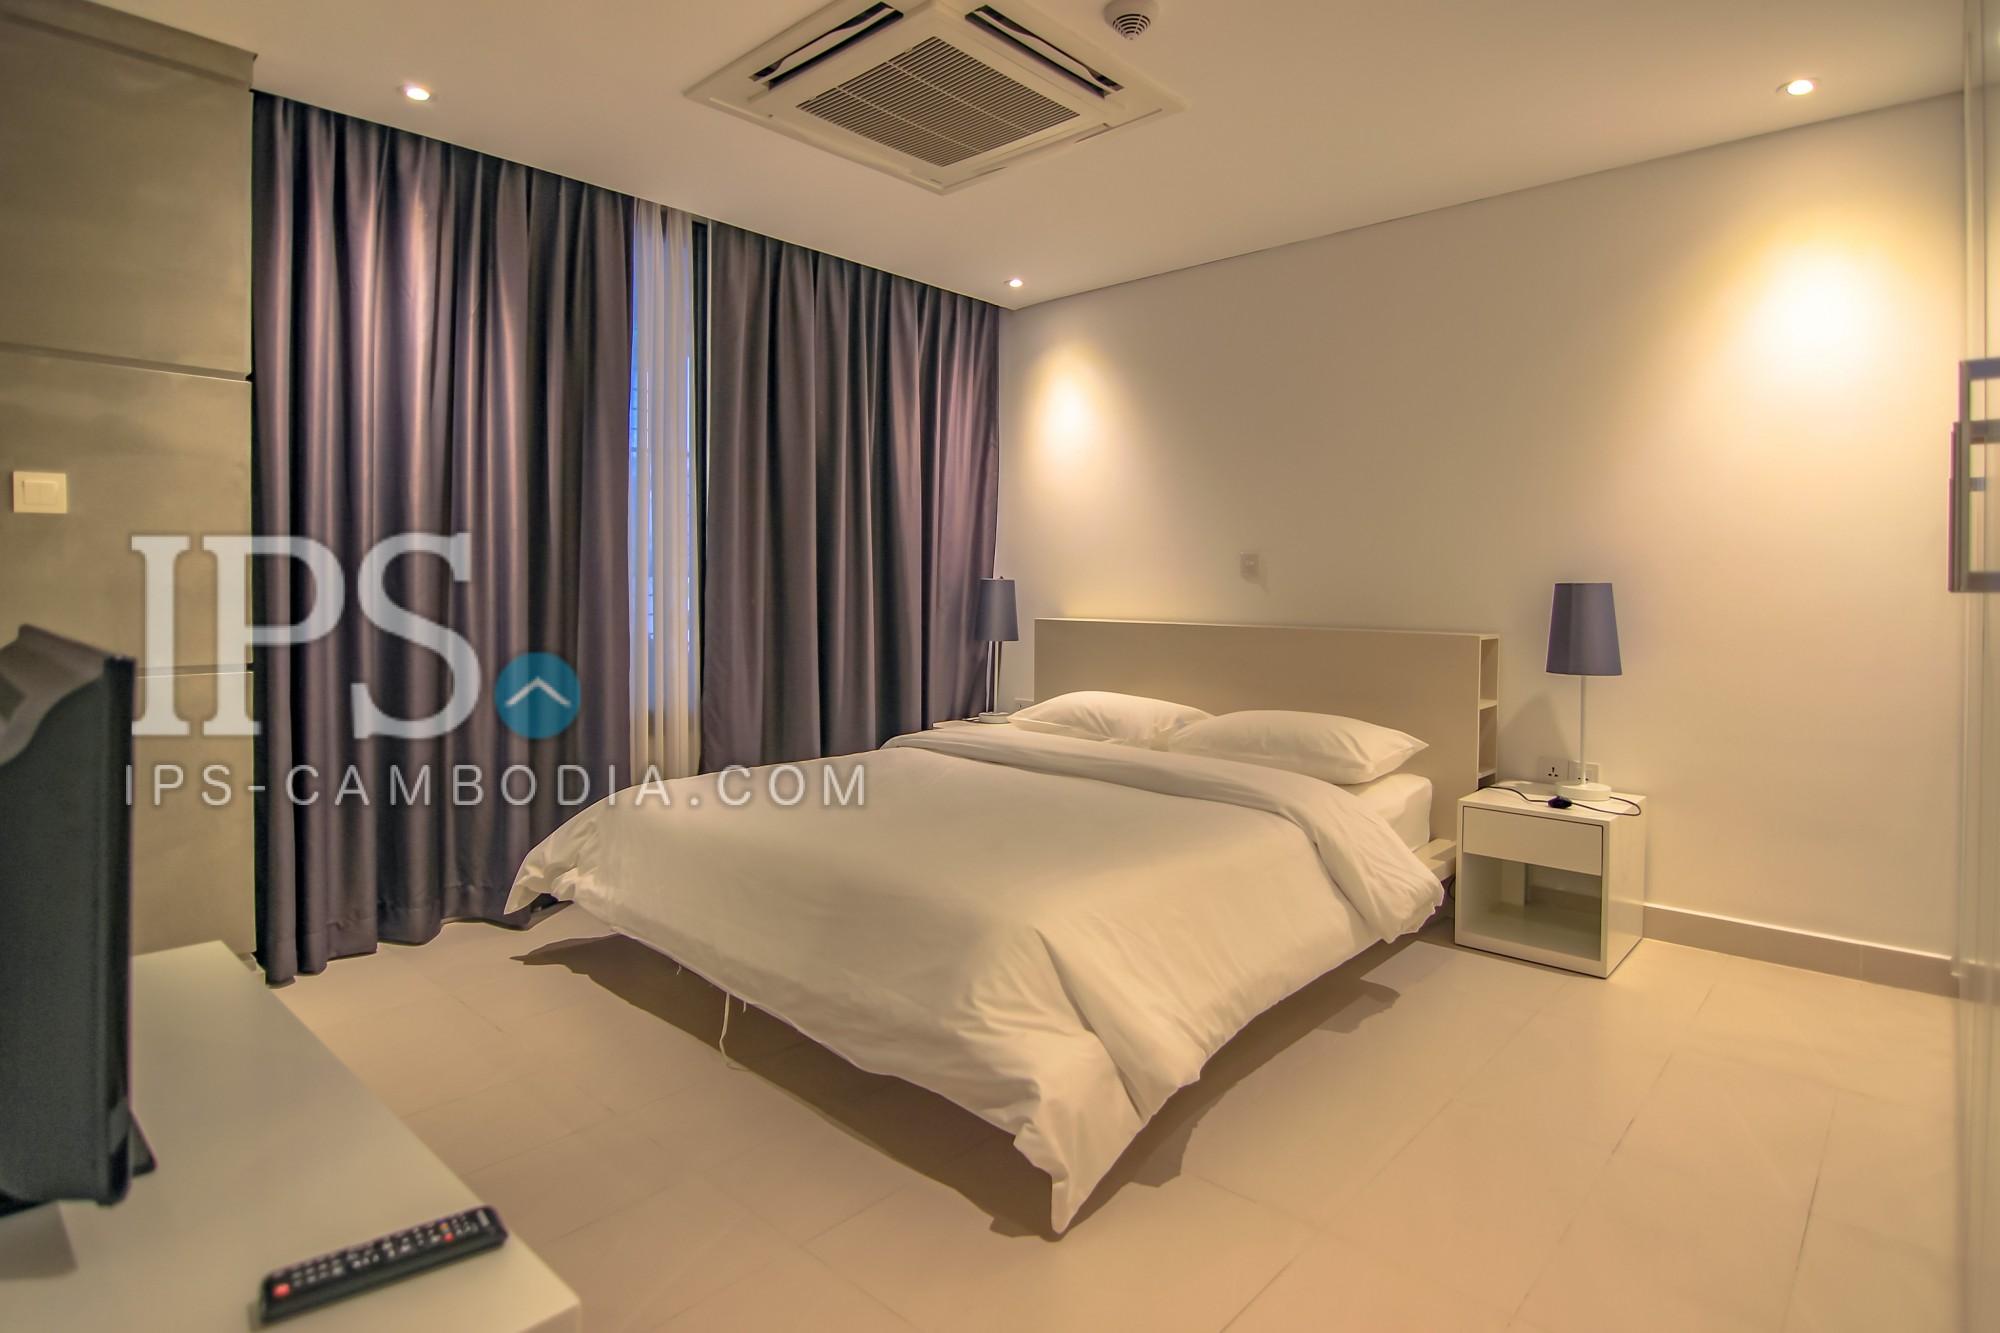 2 Bedroom Serviced Apartment for Rent - Daun Penh